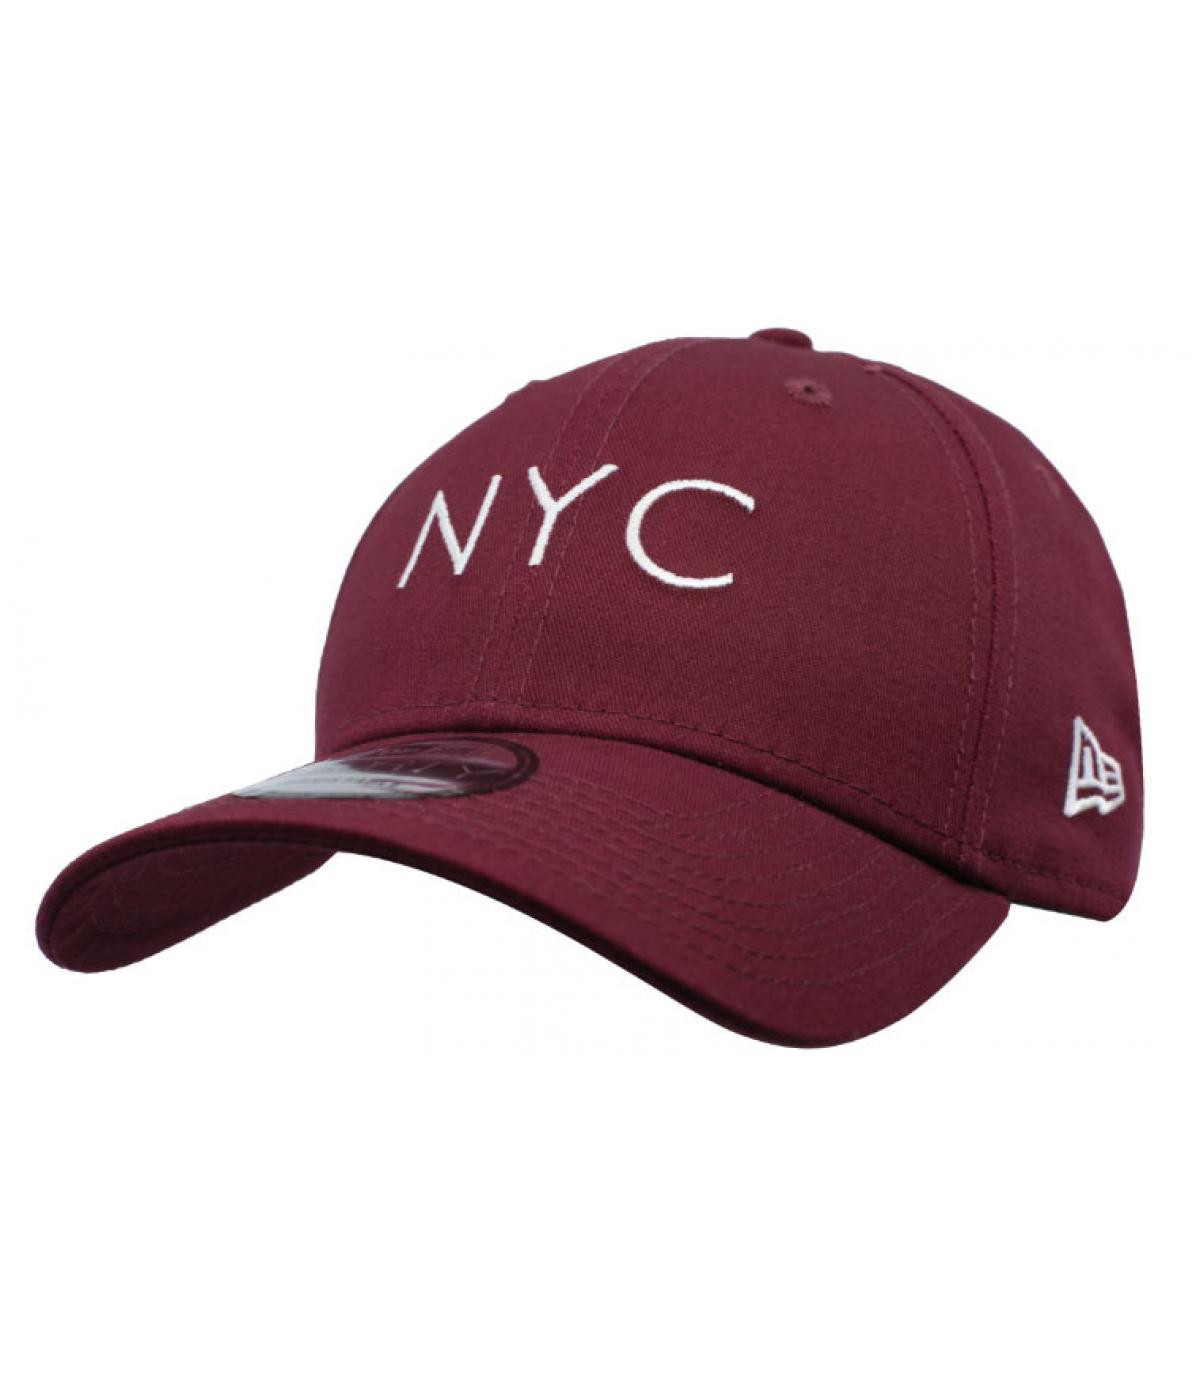 Details Cap NYC NE Ess 9Forty maroon - Abbildung 2